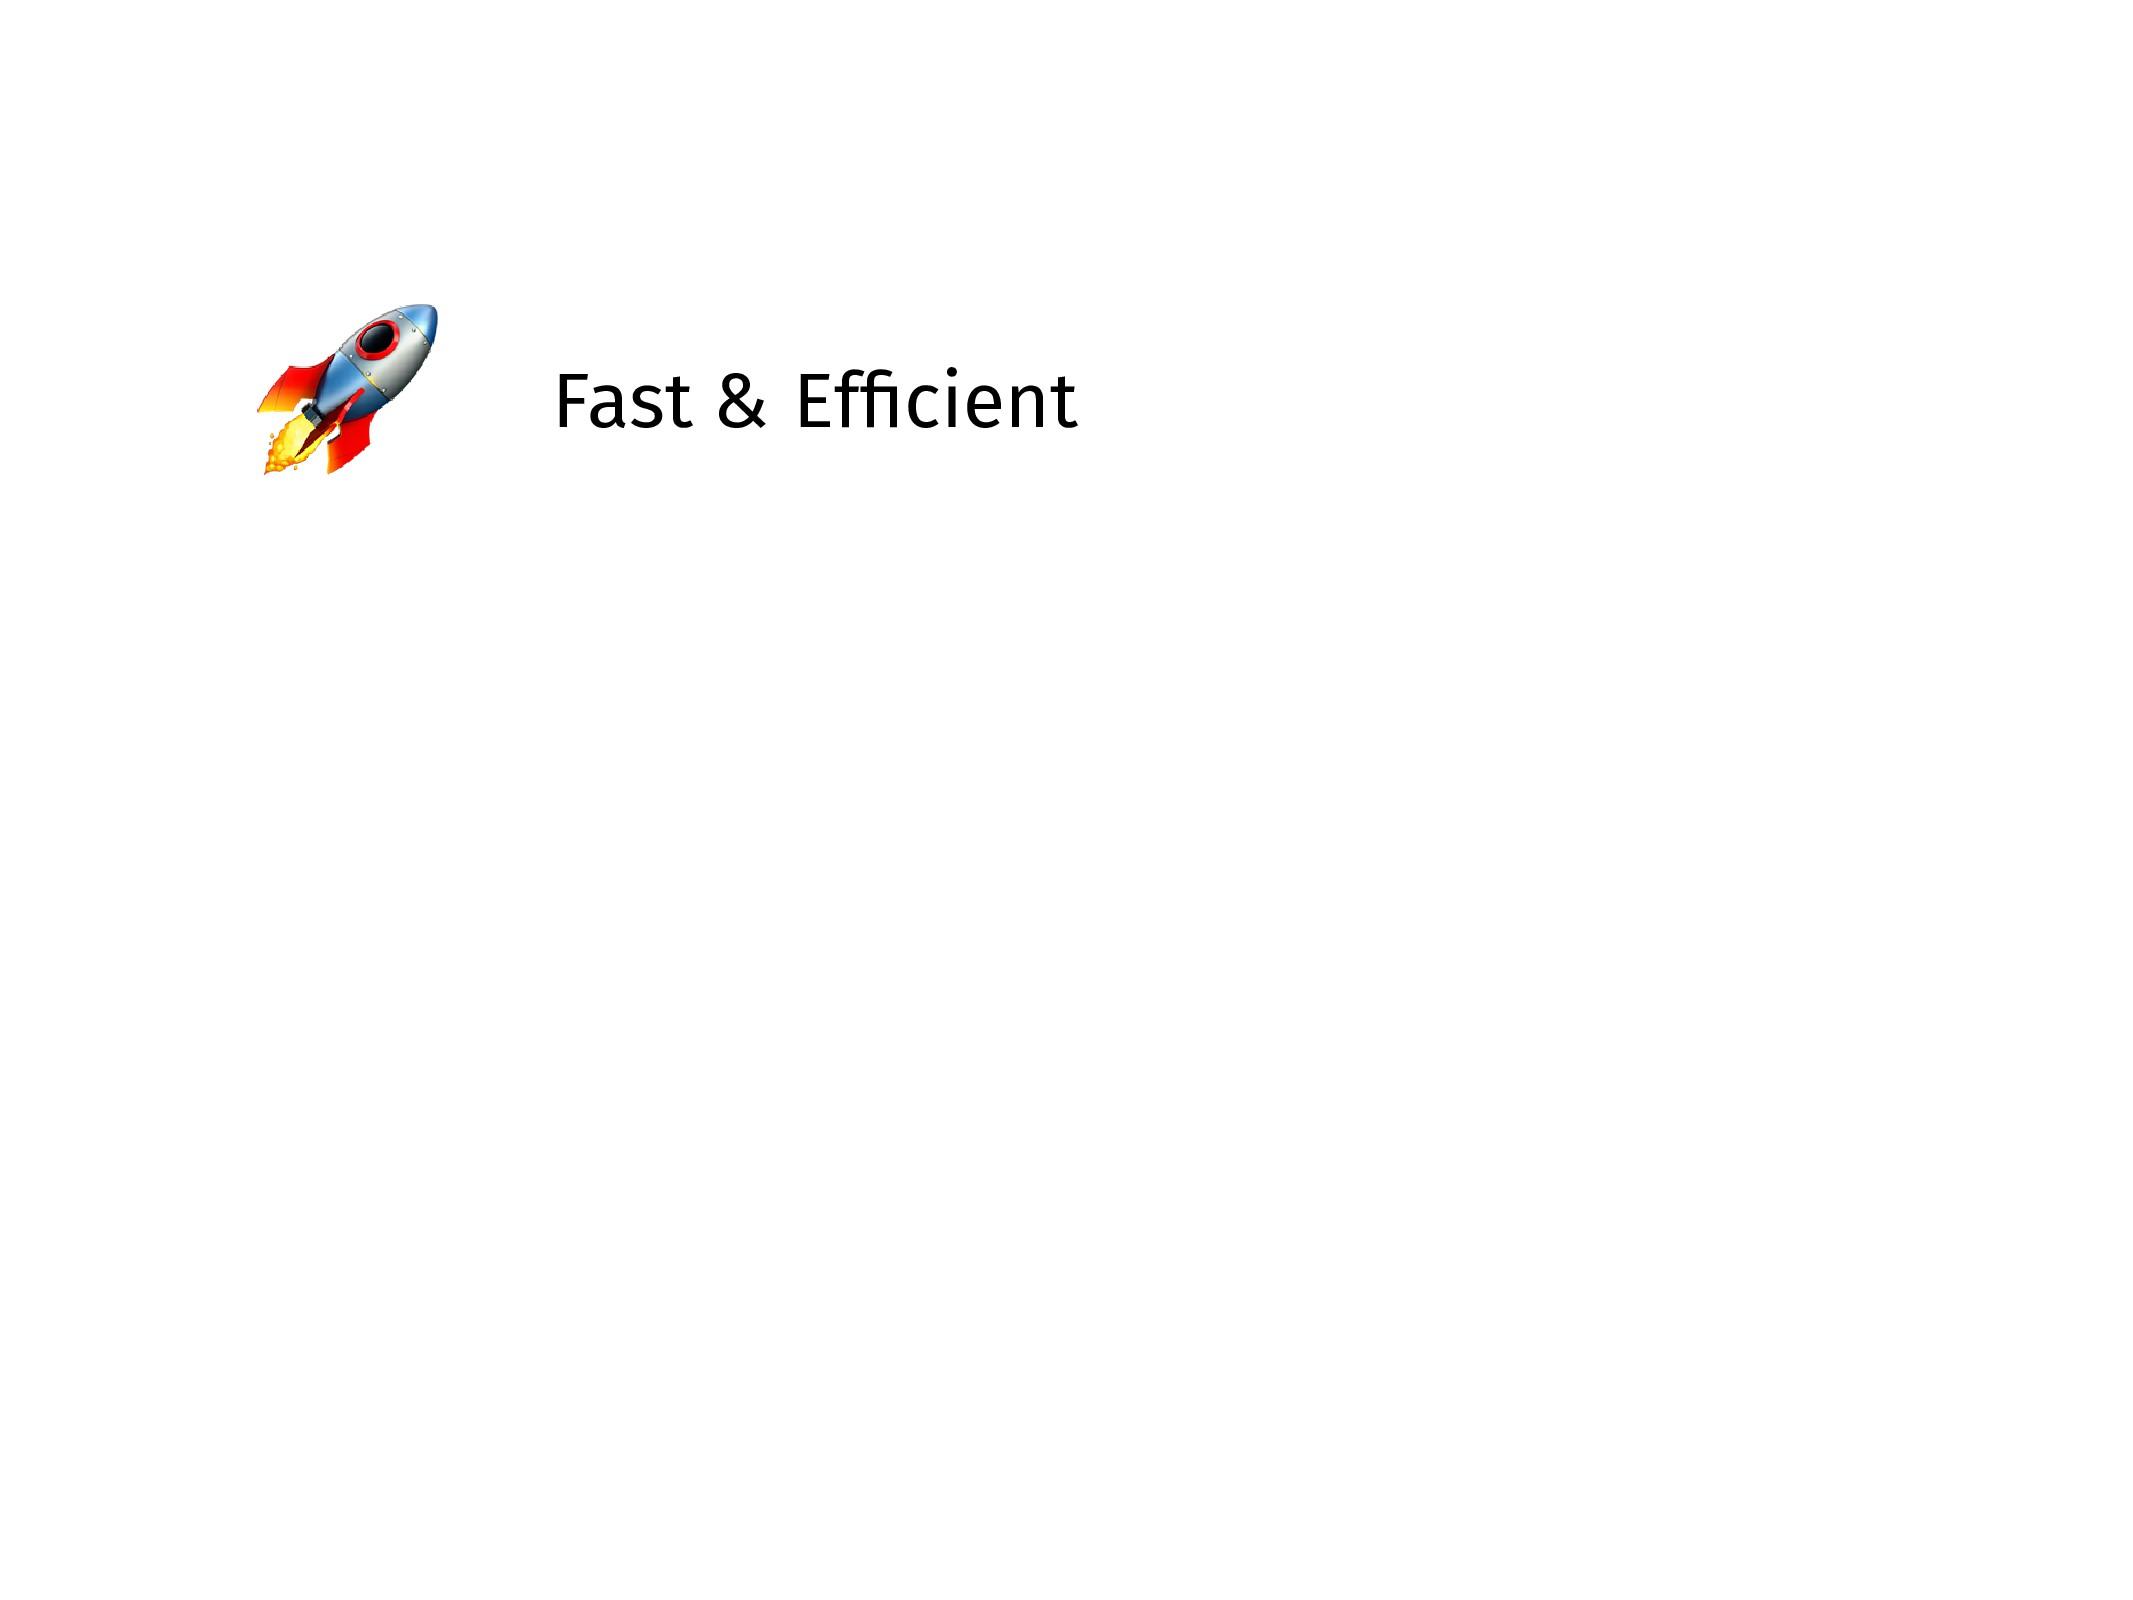 Fast & Efficient